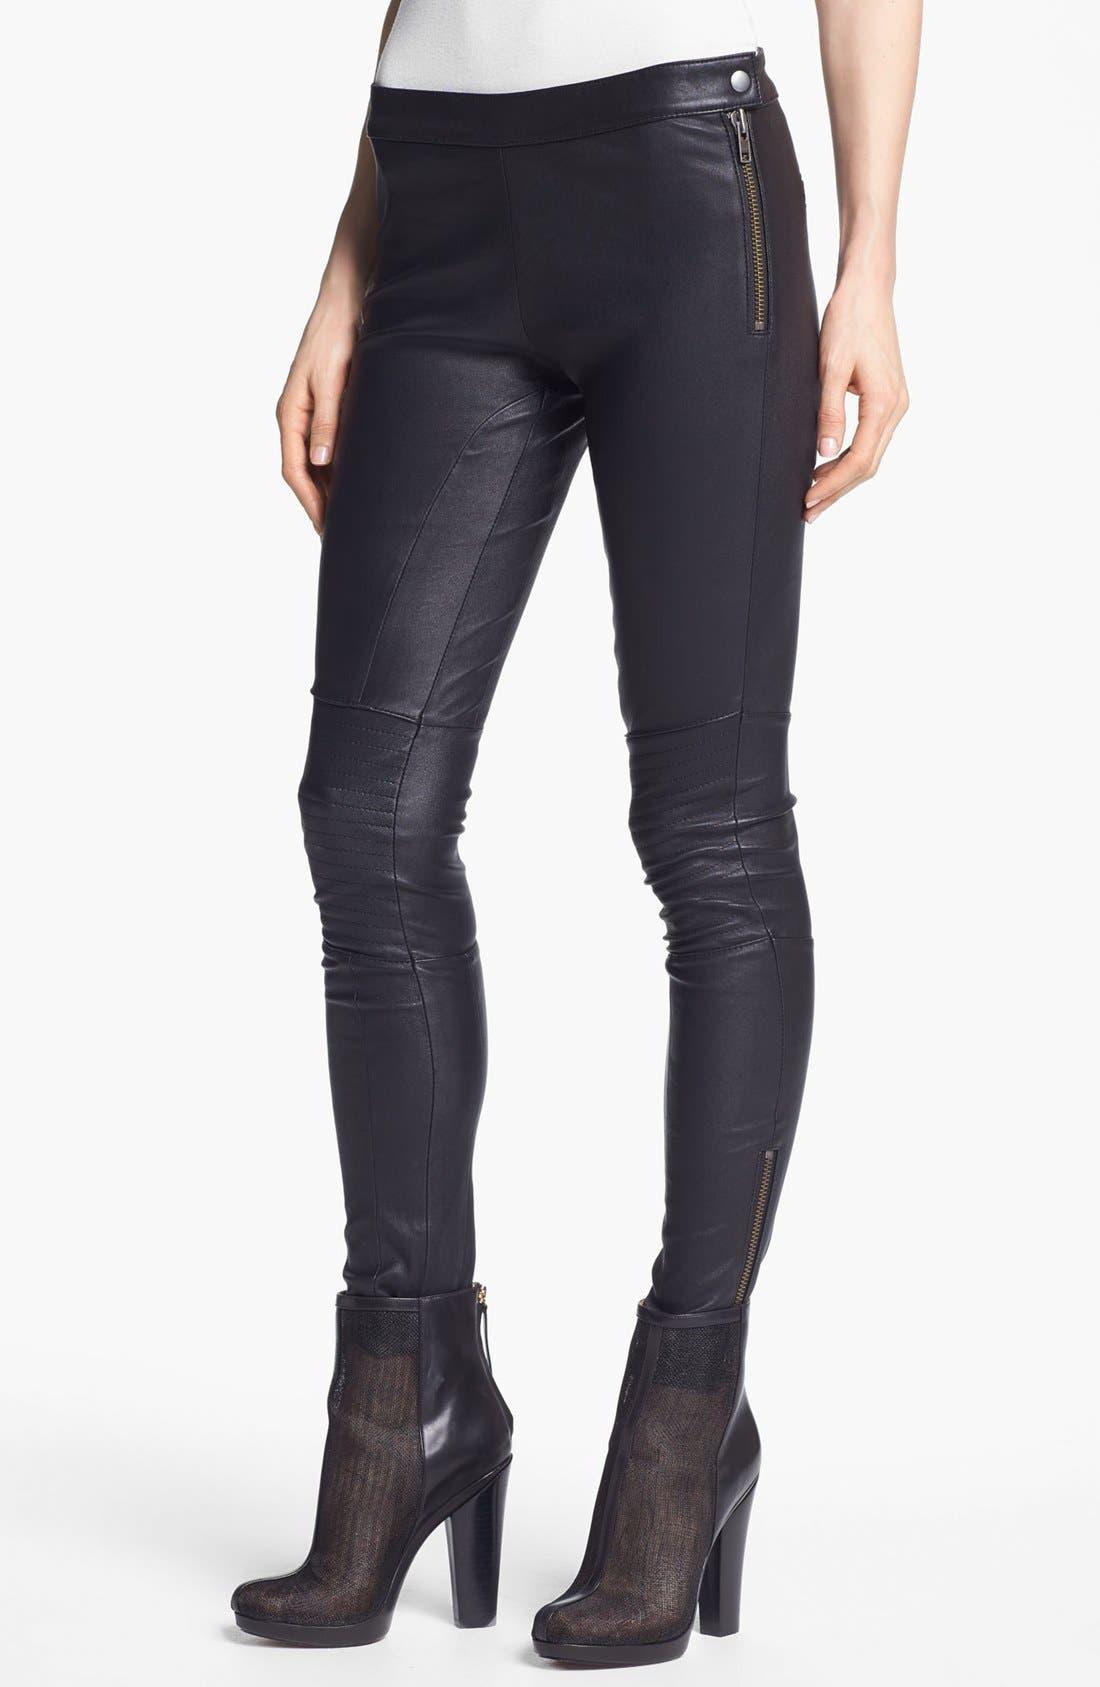 Main Image - Rachel Zoe 'Maxine' Skinny Stretch Leather Pants